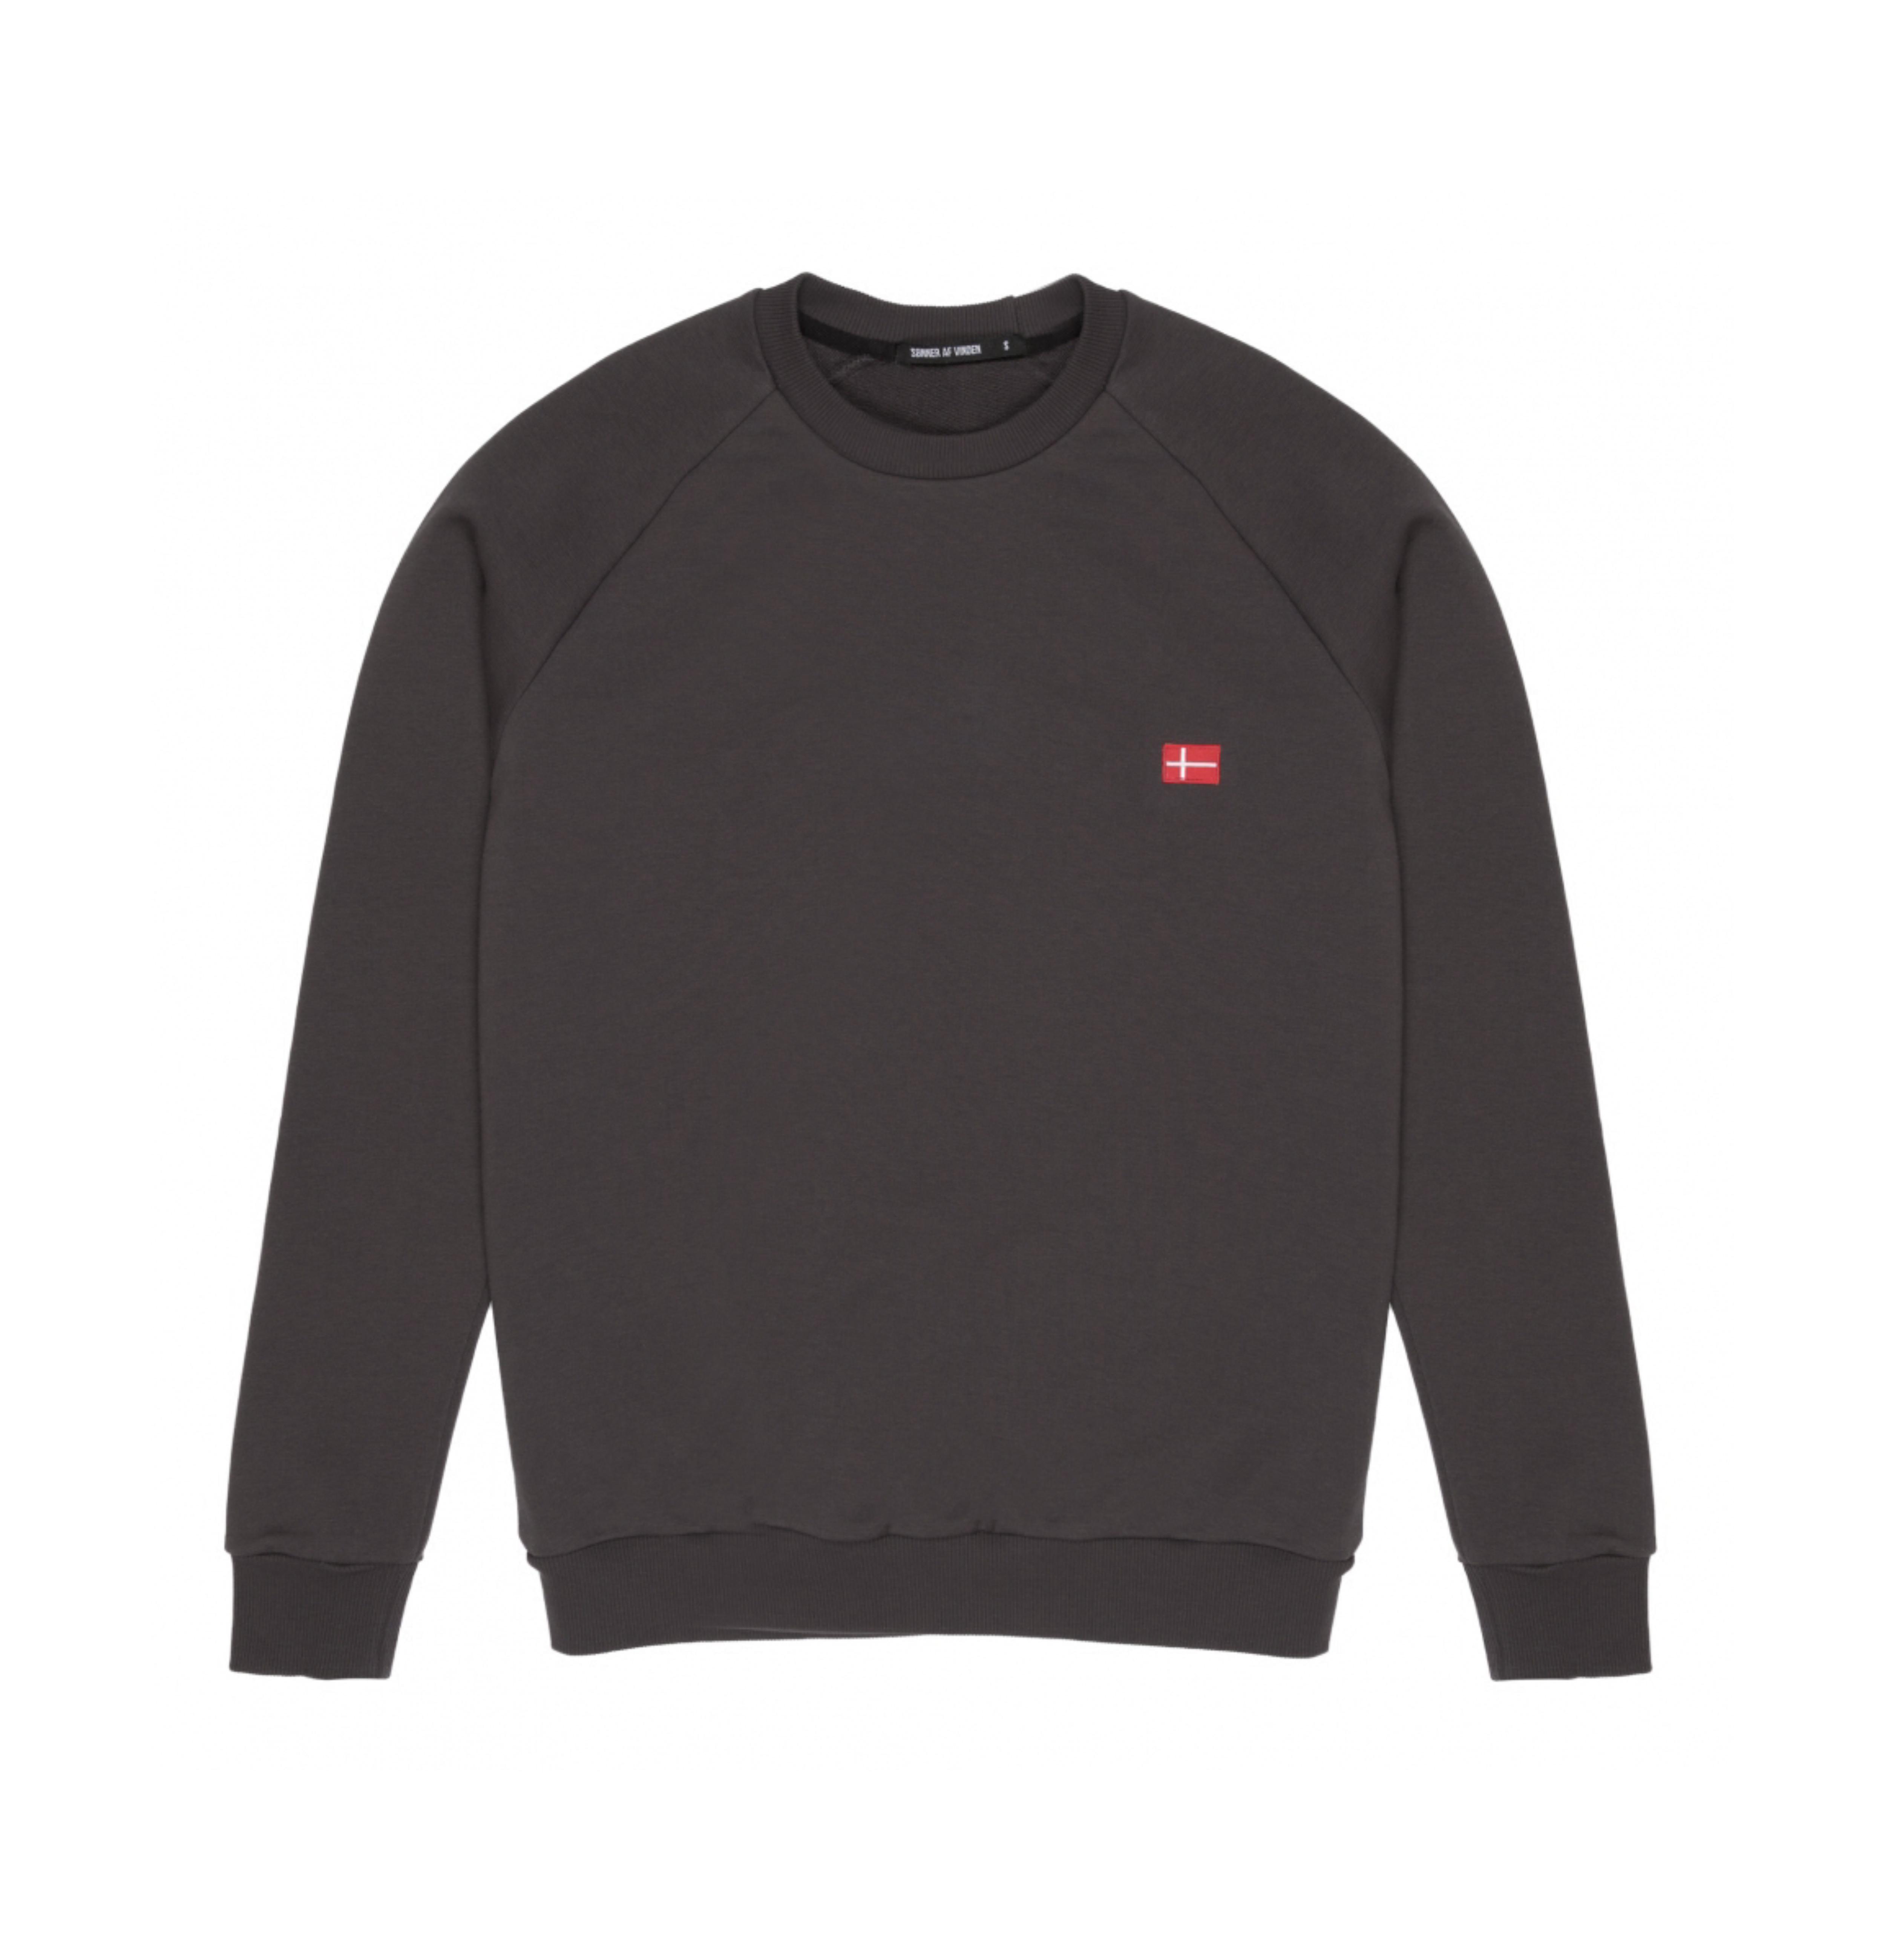 Свитшот Sonner Af Vinden Cross Charcoal Sweatshirt